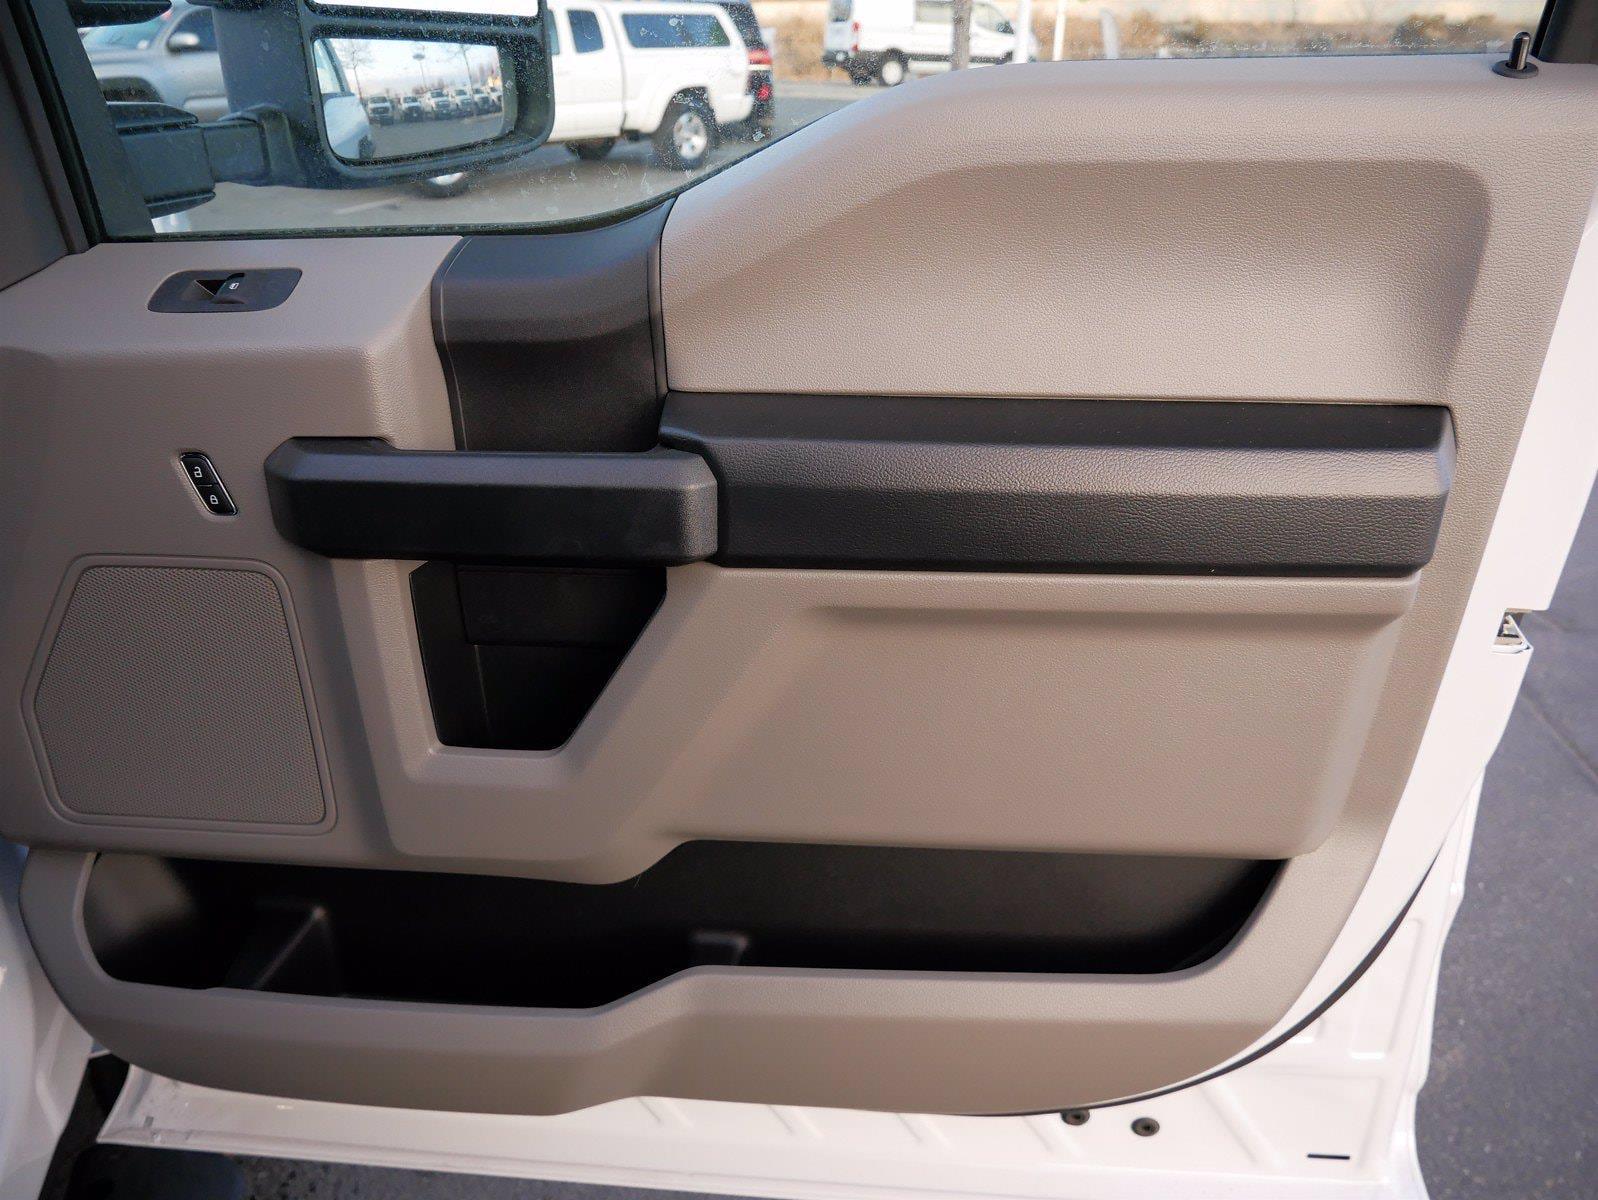 2021 Ford F-550 Regular Cab DRW 4x4, Scelzi Dump Body #64083 - photo 24